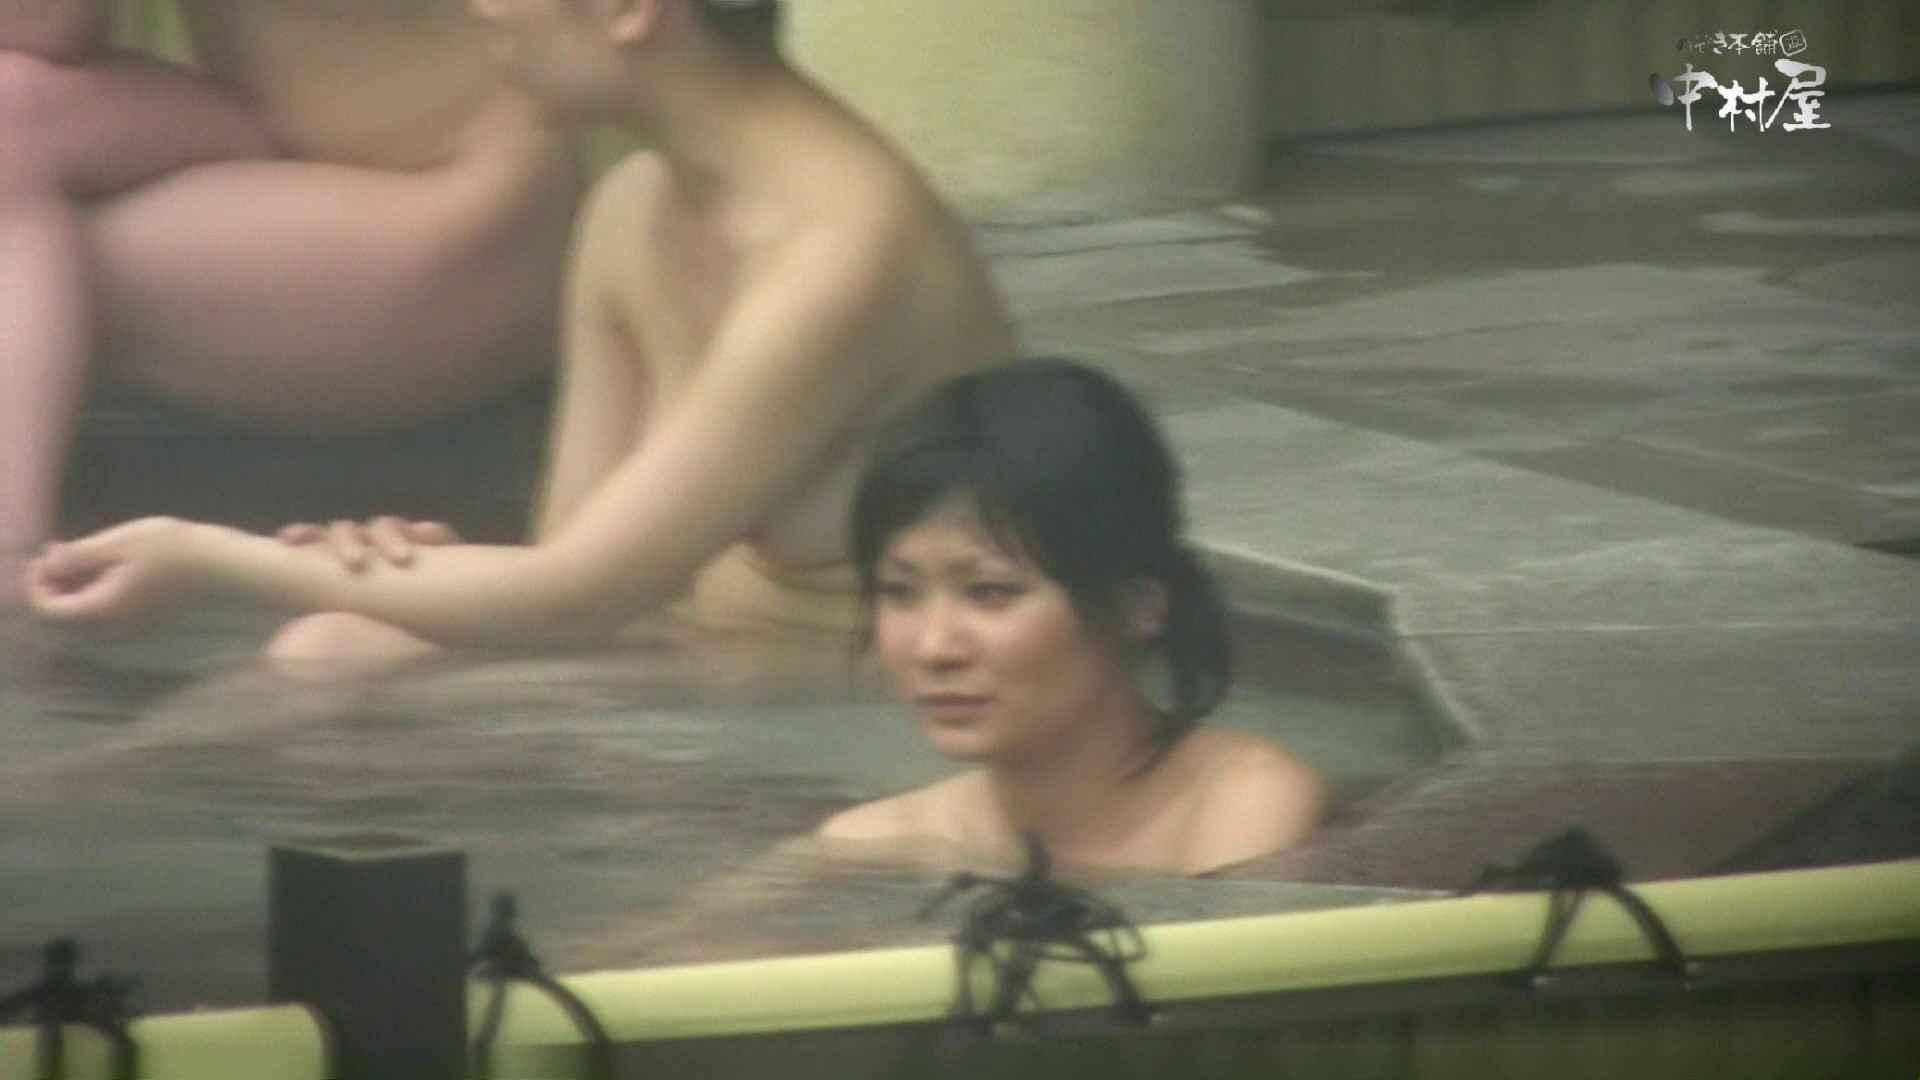 Aquaな露天風呂Vol.890 盗撮シリーズ   露天風呂編  93PIX 13